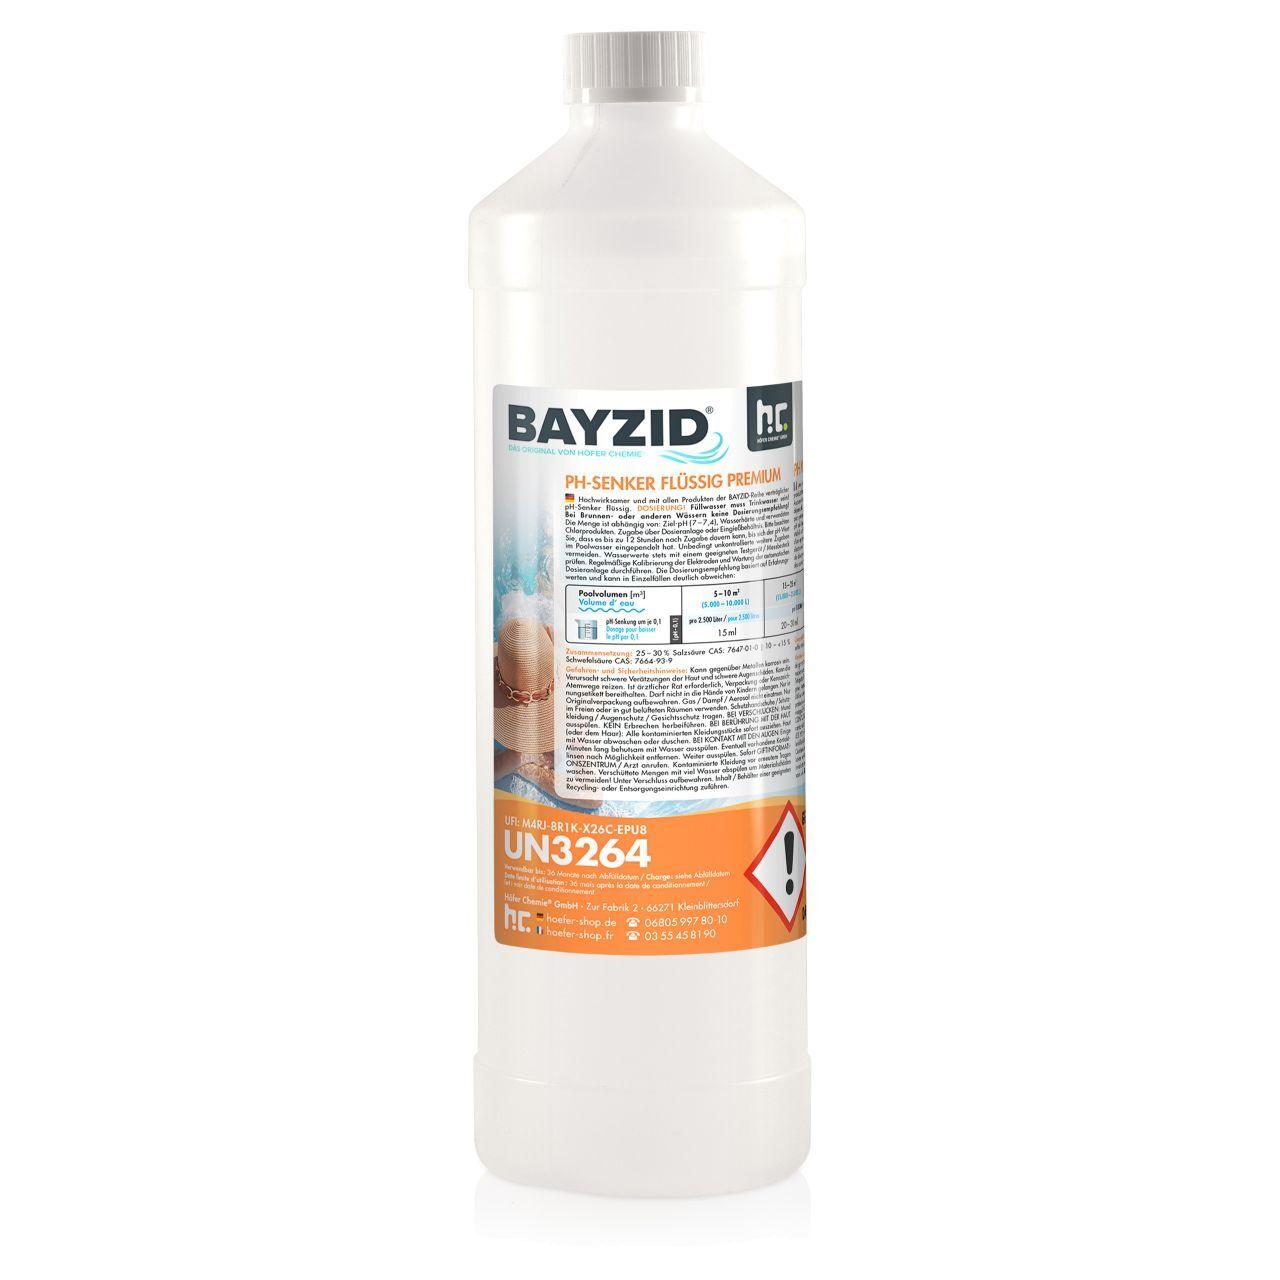 BAYZID 30 kg Bayzid® pH moins liquide (30 x 1 kg)